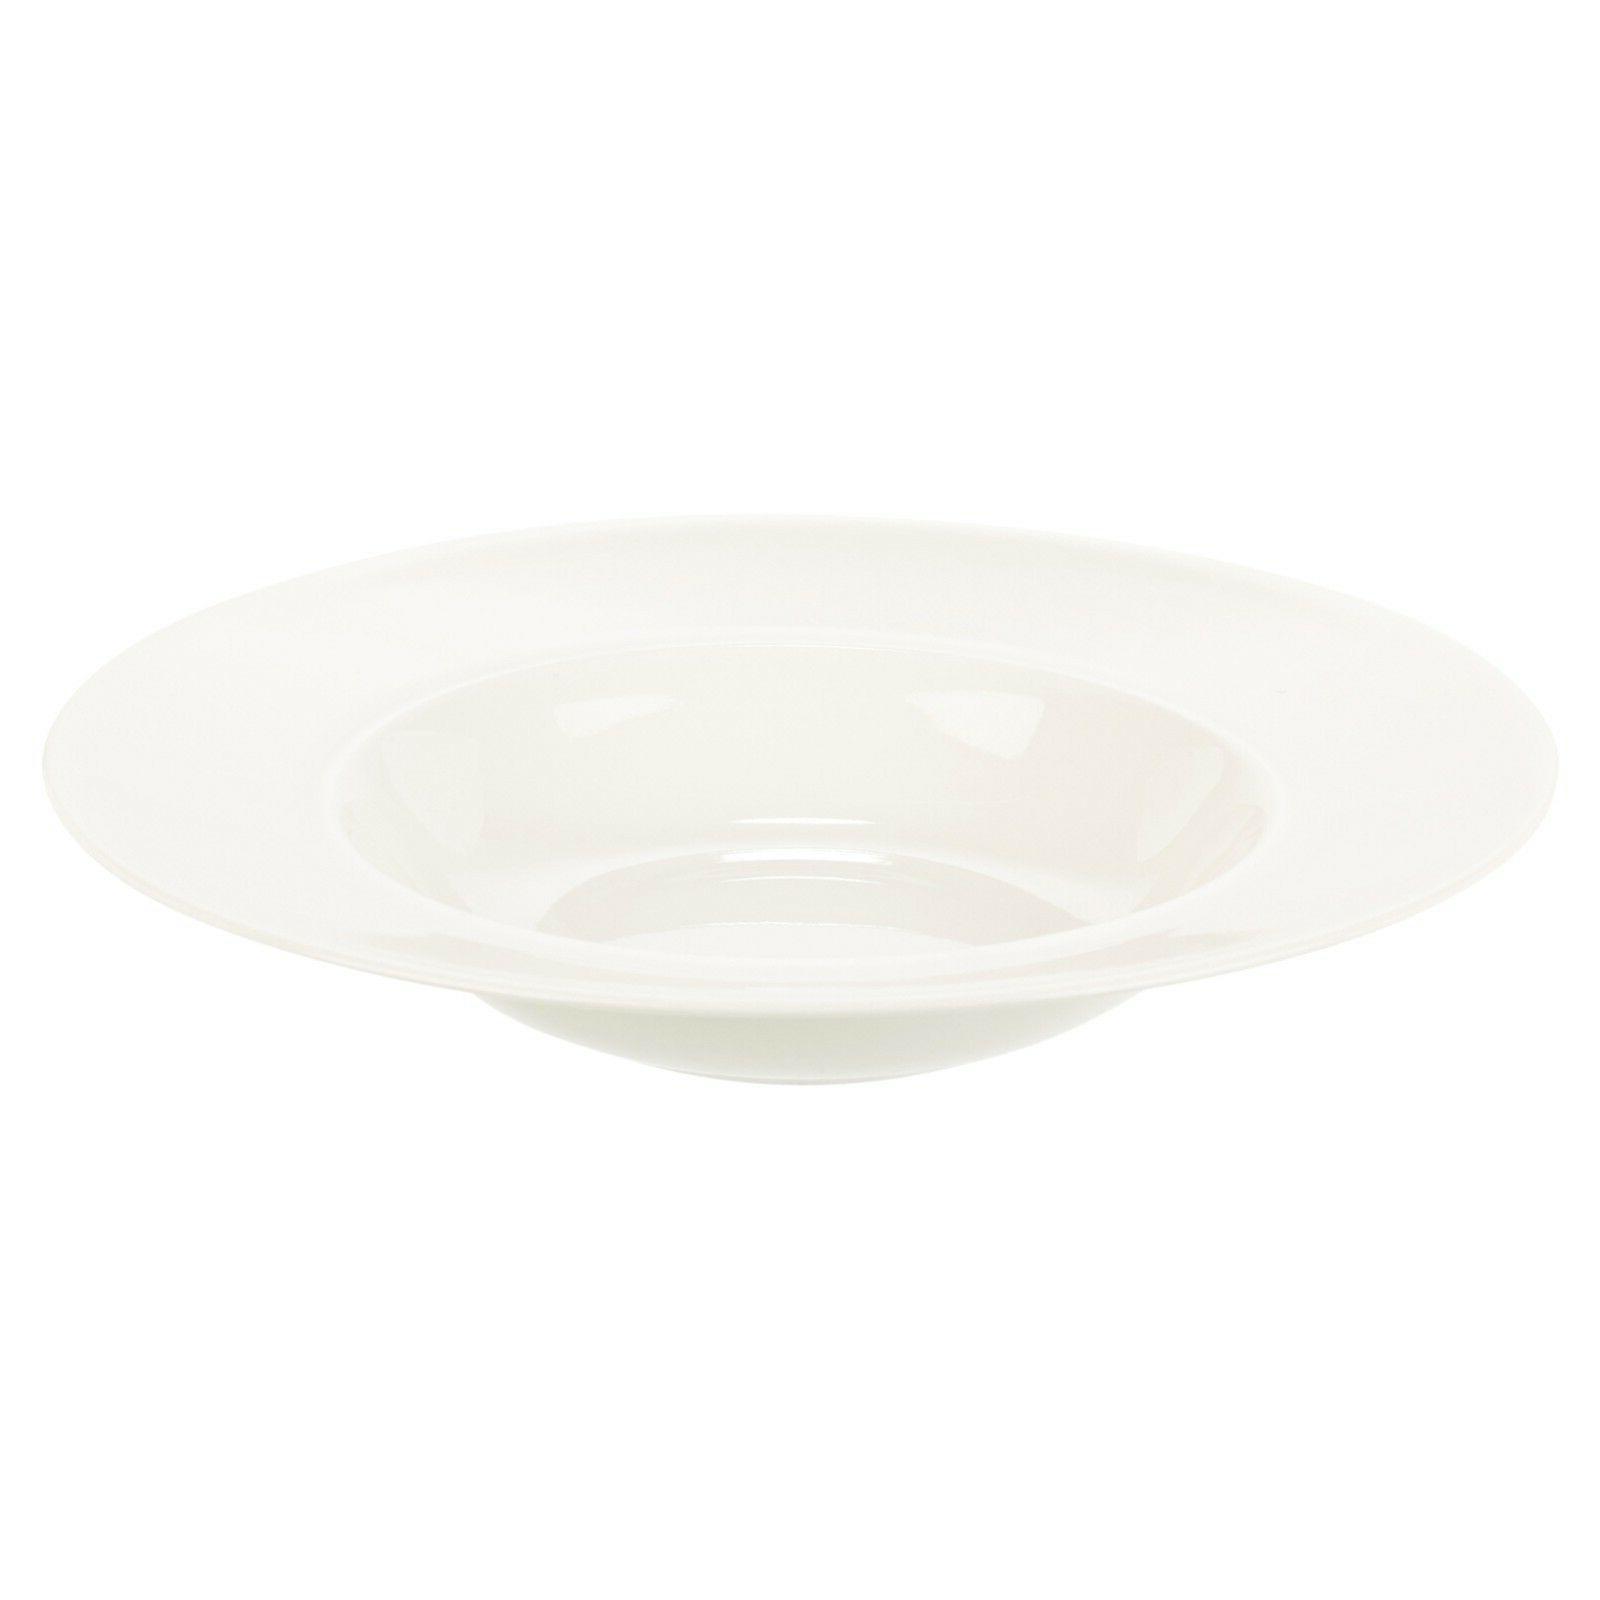 ALESSI Service Porcelain Tableware Plate Set